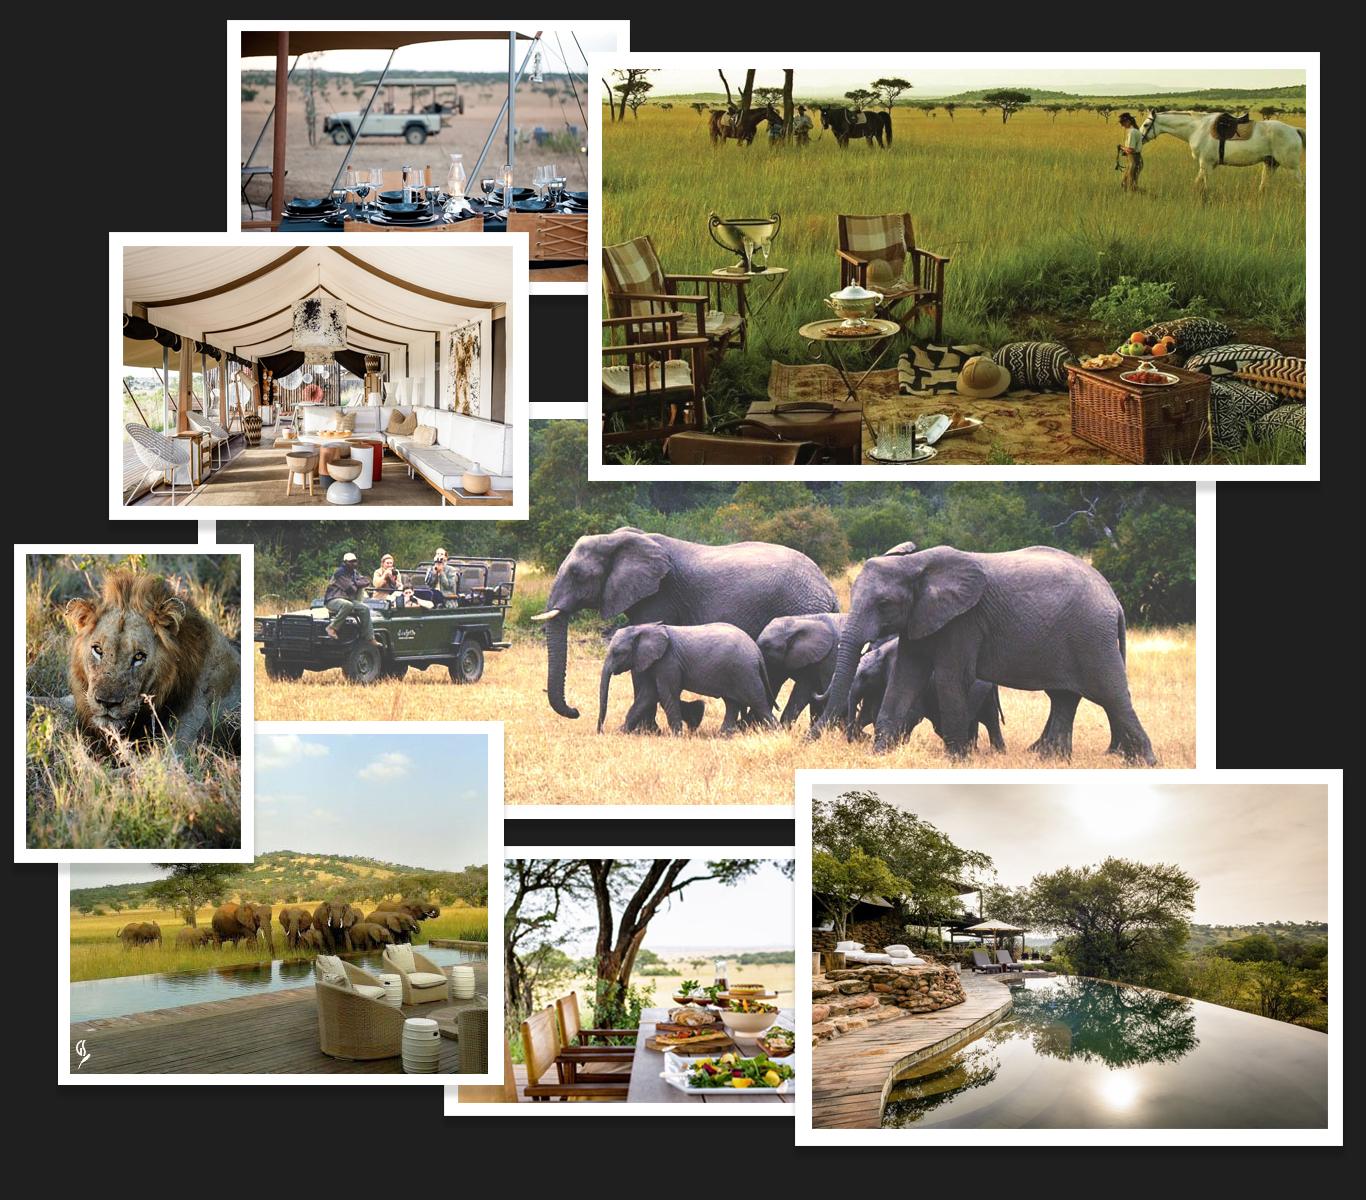 creations-luxury-travel-africa-safari.jpg